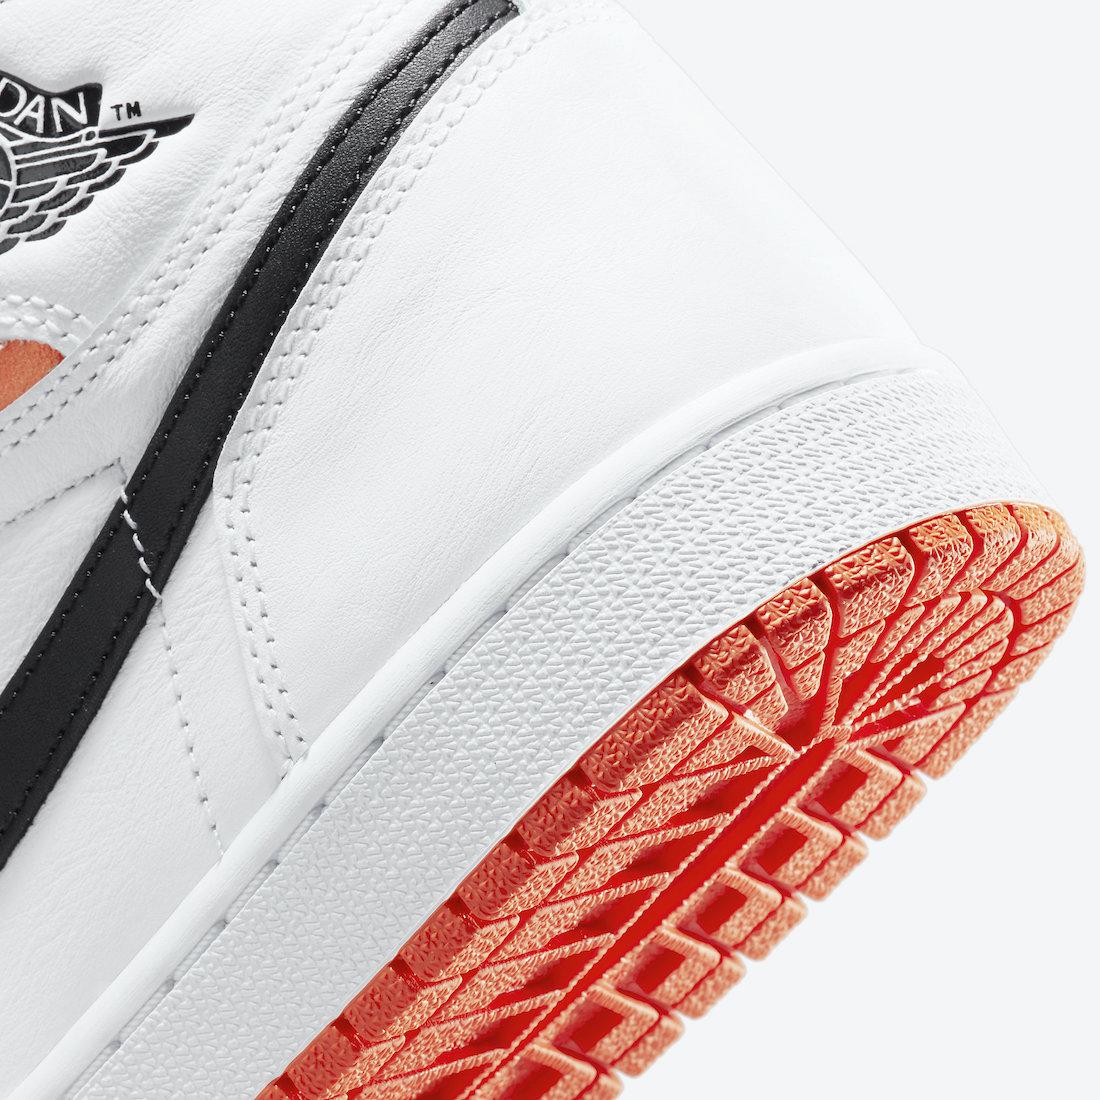 Air-Jordan-1-High-OG-Electro-Orange-555088-180-Release-Date-7